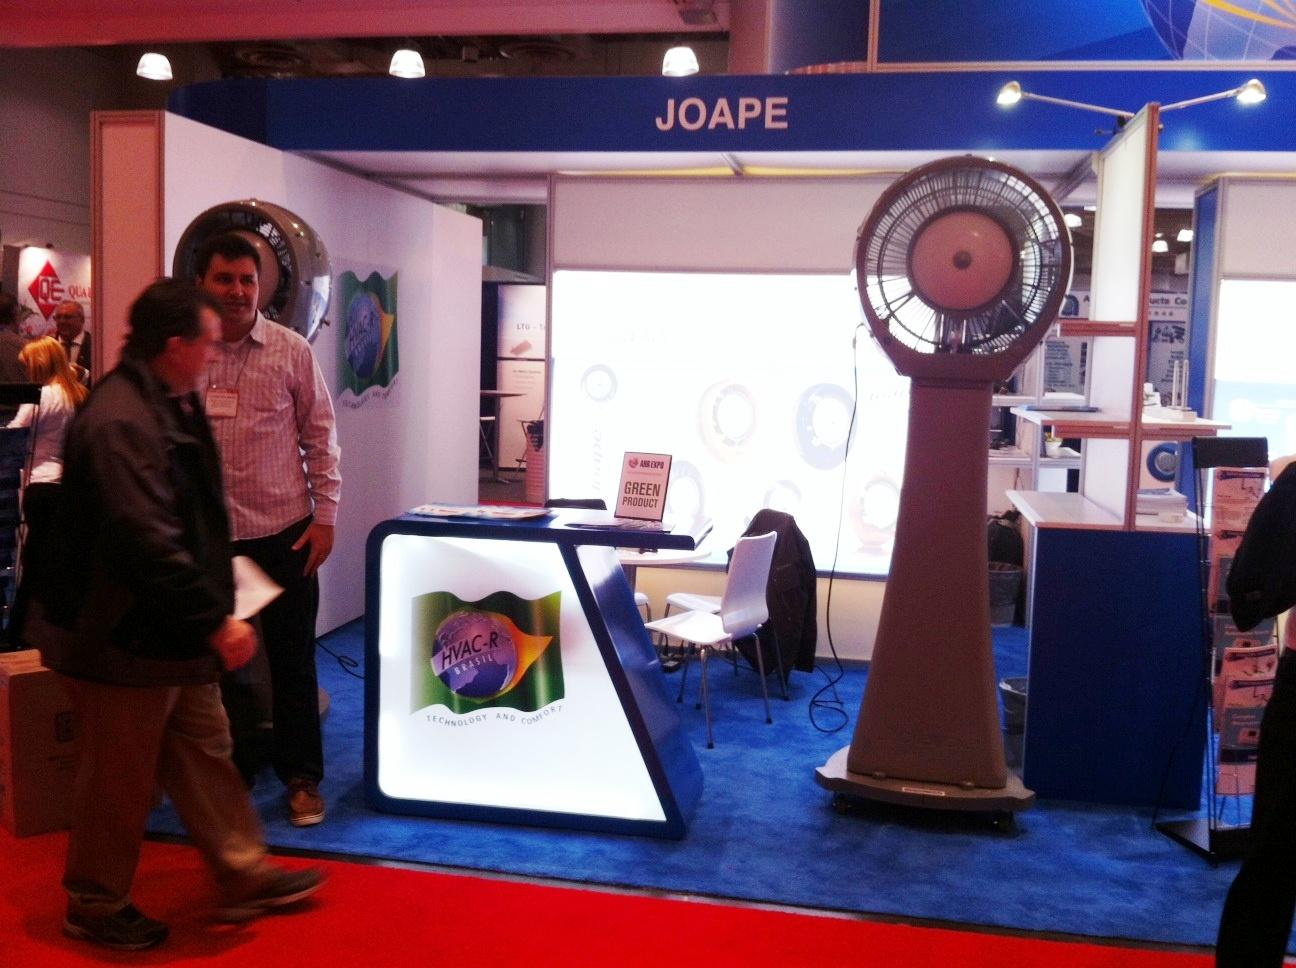 Estande da Joape na AHR - Expo 2014